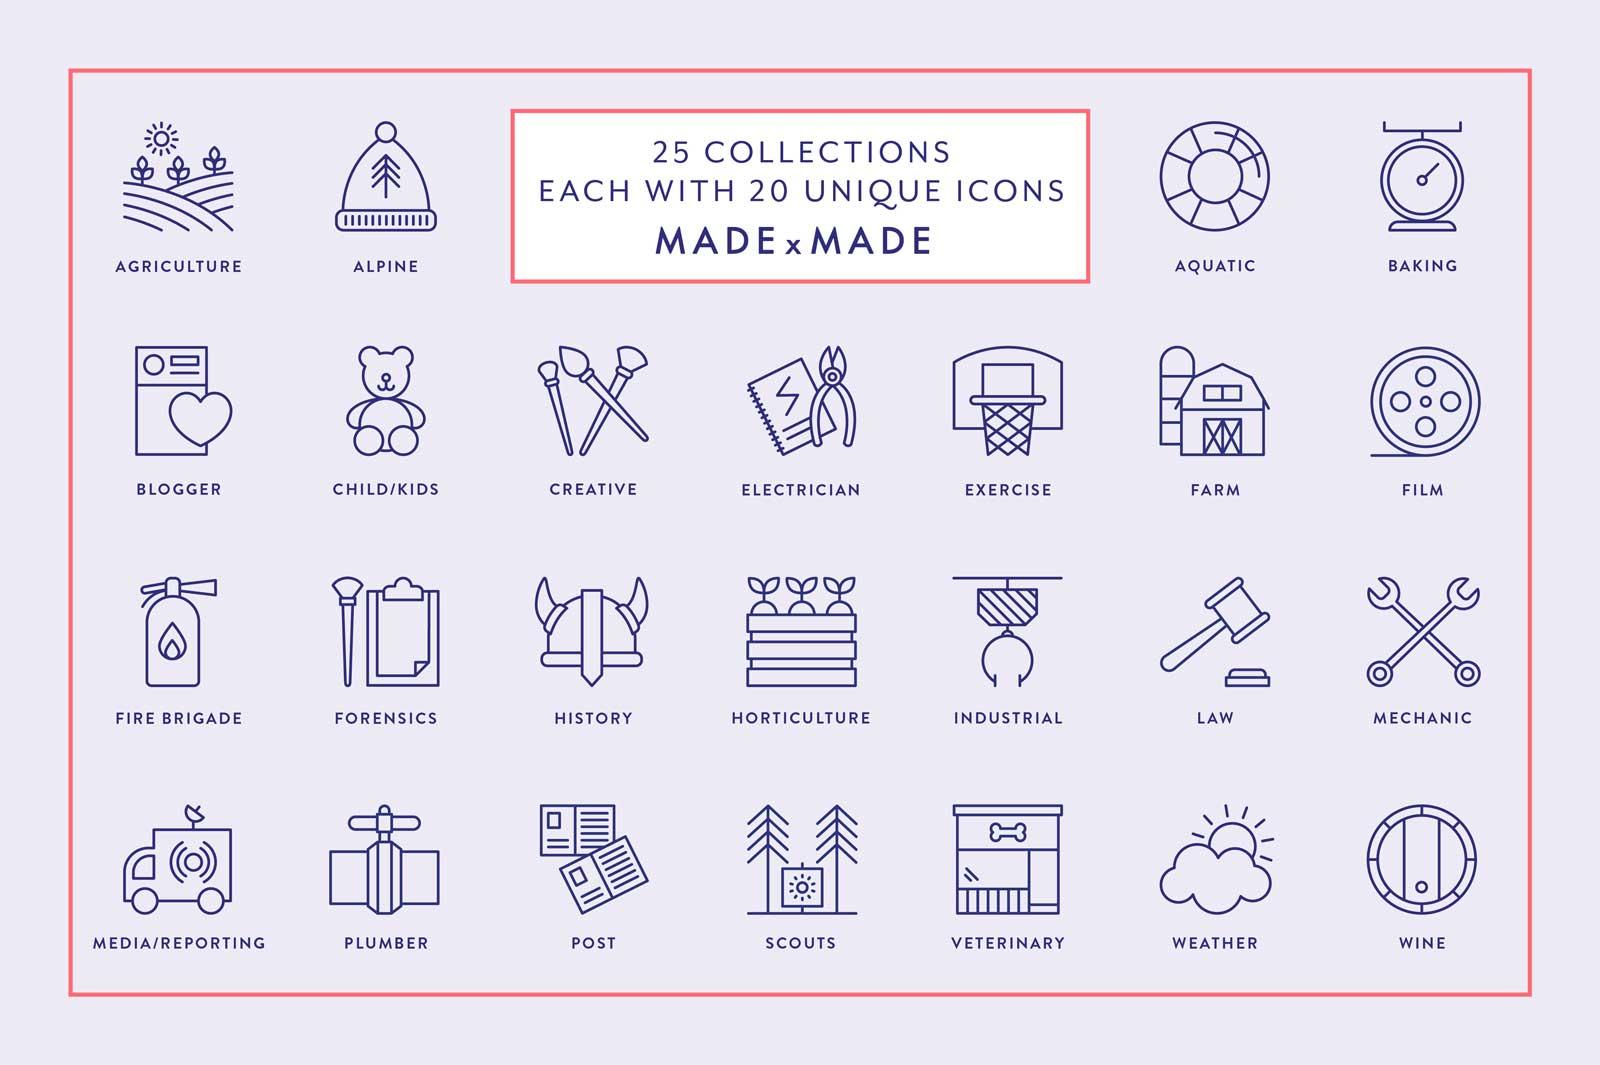 made x made icons mega bundle vol 4